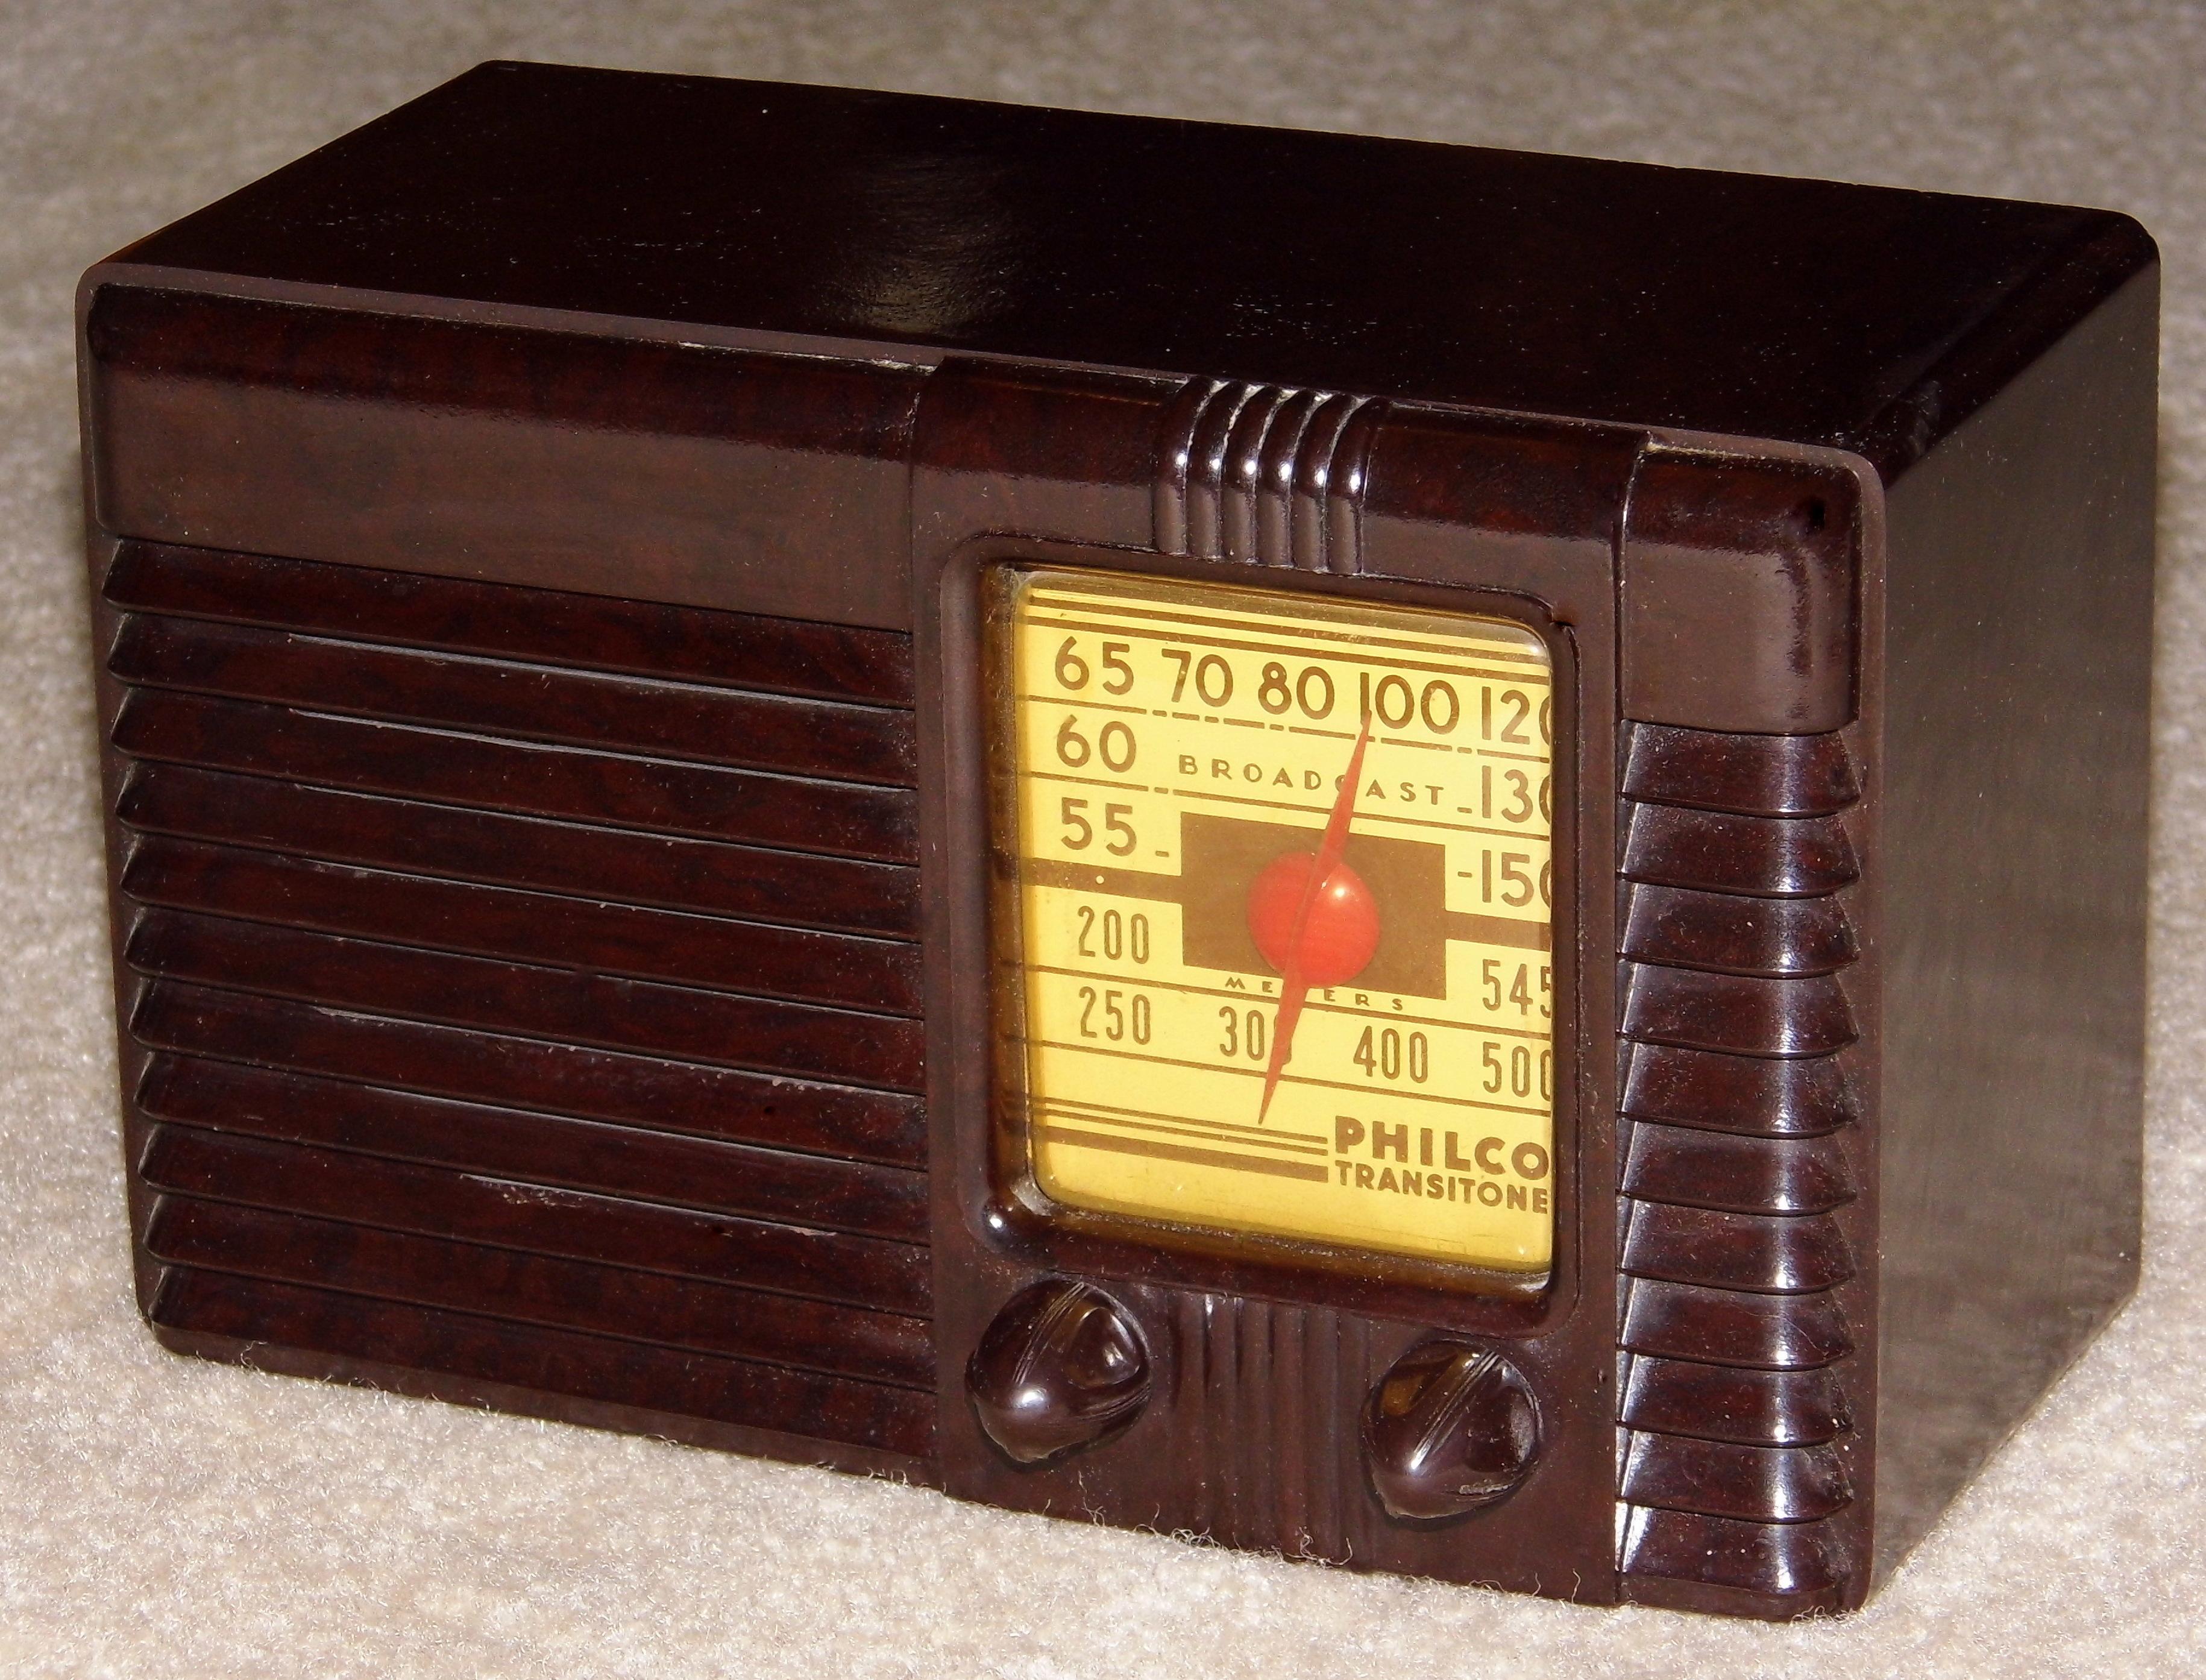 FileVintage Philco Transitone Bakelite Table Radio Model 42 PT26 Circa 1942 13150197935